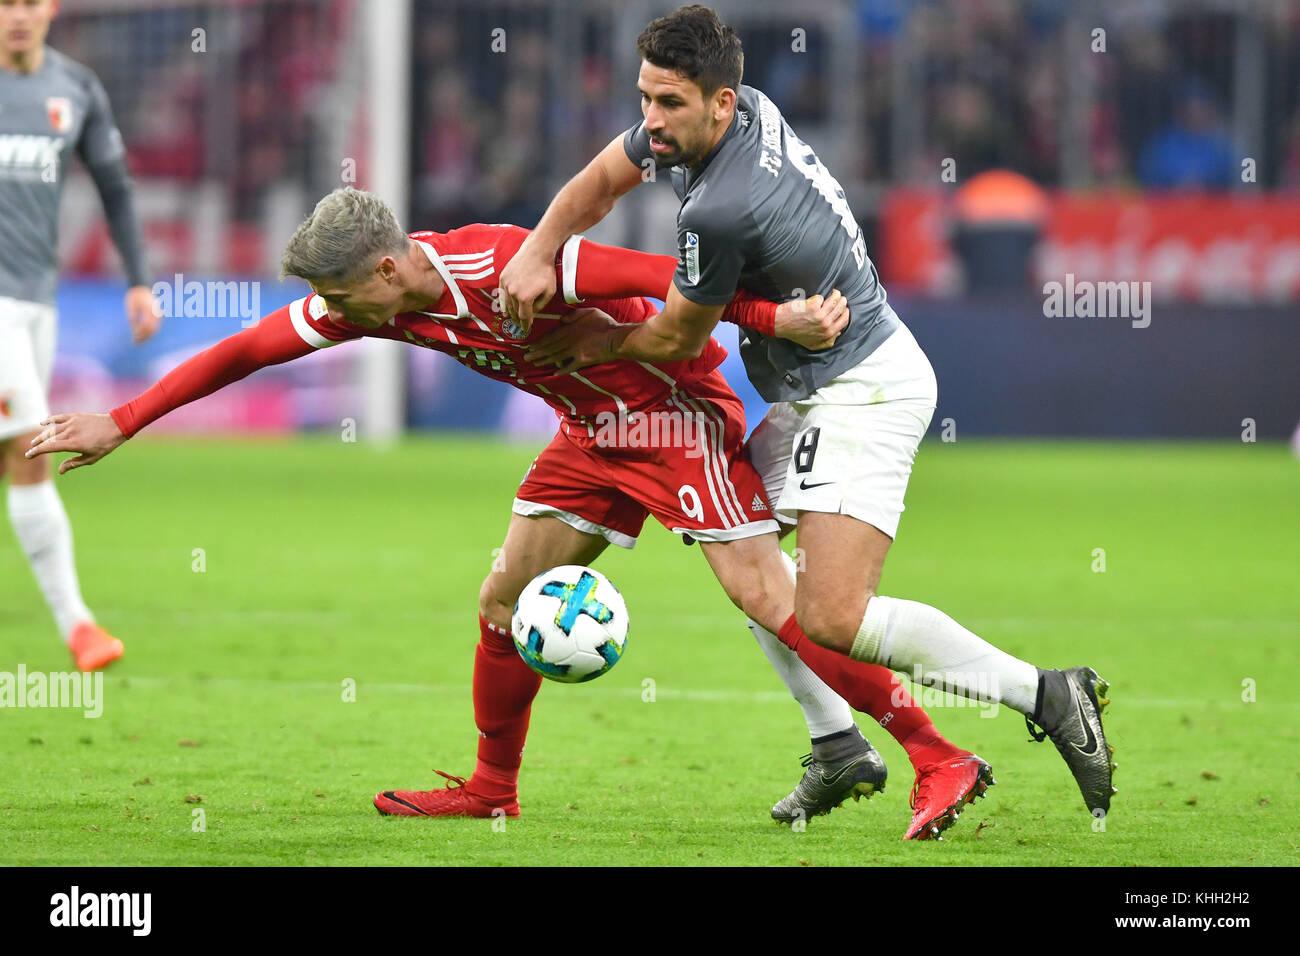 Robert LEWANDOWSKI (FC Bayern Munich) kommt beim Zweikamof with Rani KHEDIRA (FC Augsburg) zu Fall, Aktion. Fussball - Stock Image